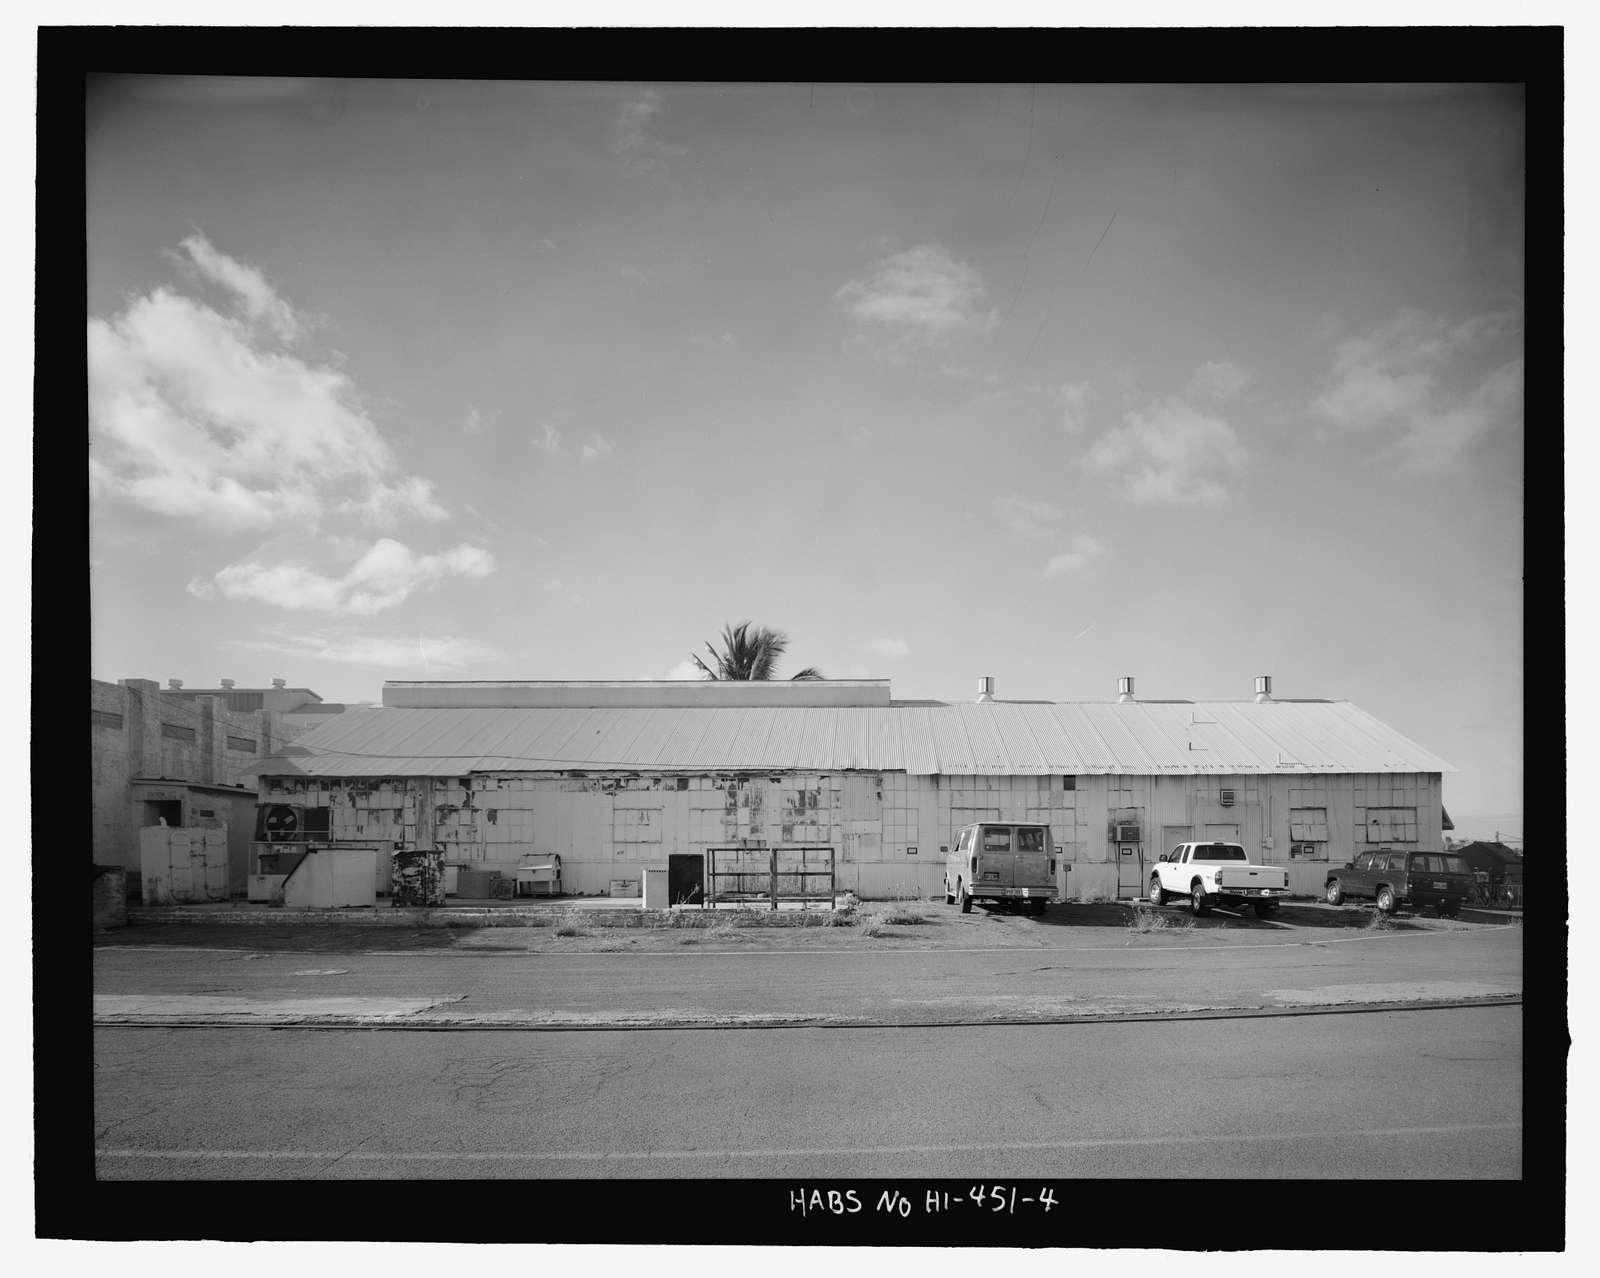 U.S. Naval Base, Pearl Harbor, Marine Railway No. 1 Accessories House & Apprentice Welding School, Additions, Intersection of Avenue B & Sixth Street, Pearl City, Honolulu County, HI